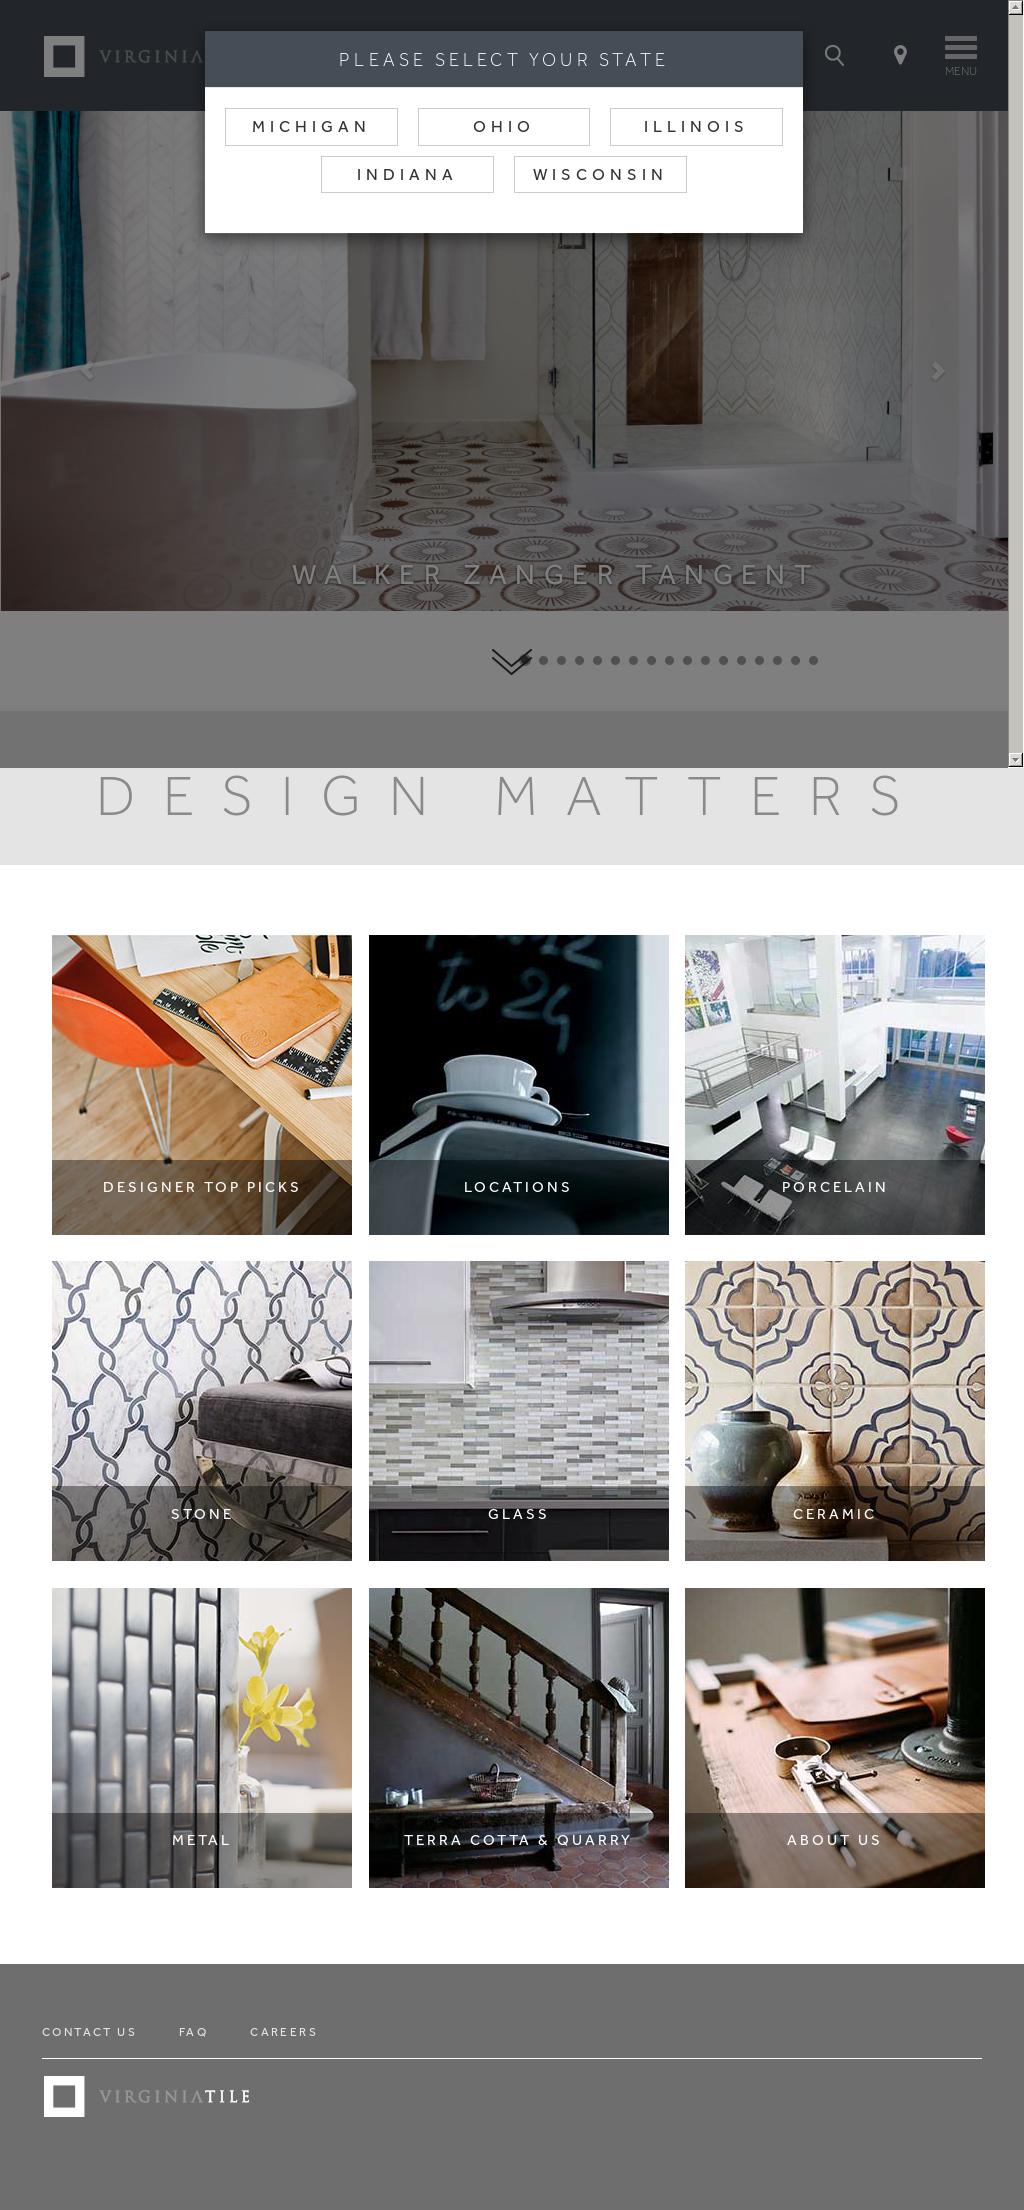 Virginia Tile Illinois | Tile Design Ideas